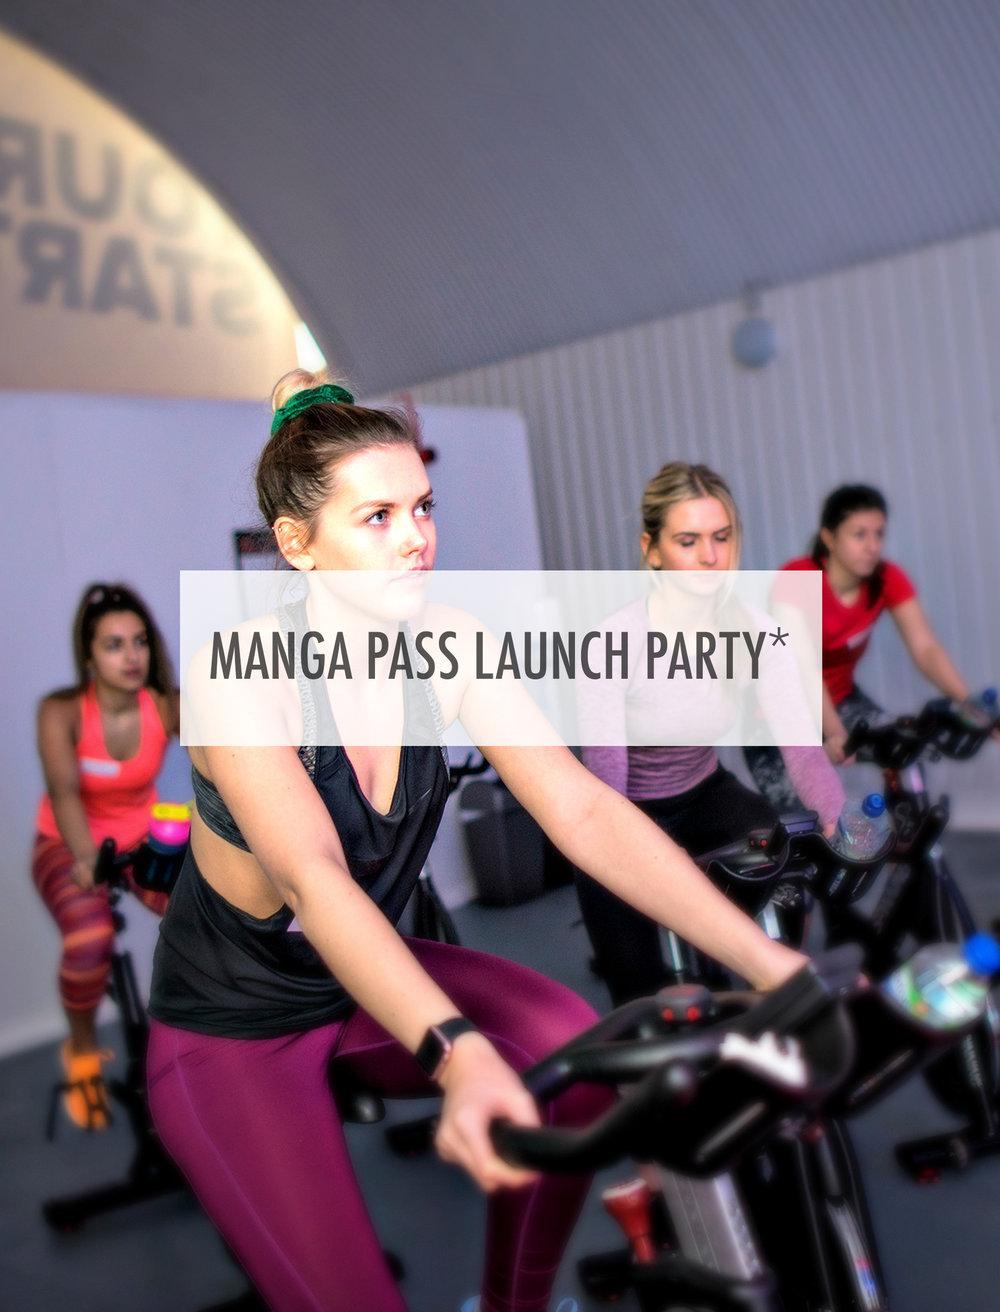 http://www.amyelizabethfashion.com/blogposts/2017/2/17/magnapass-launch-party